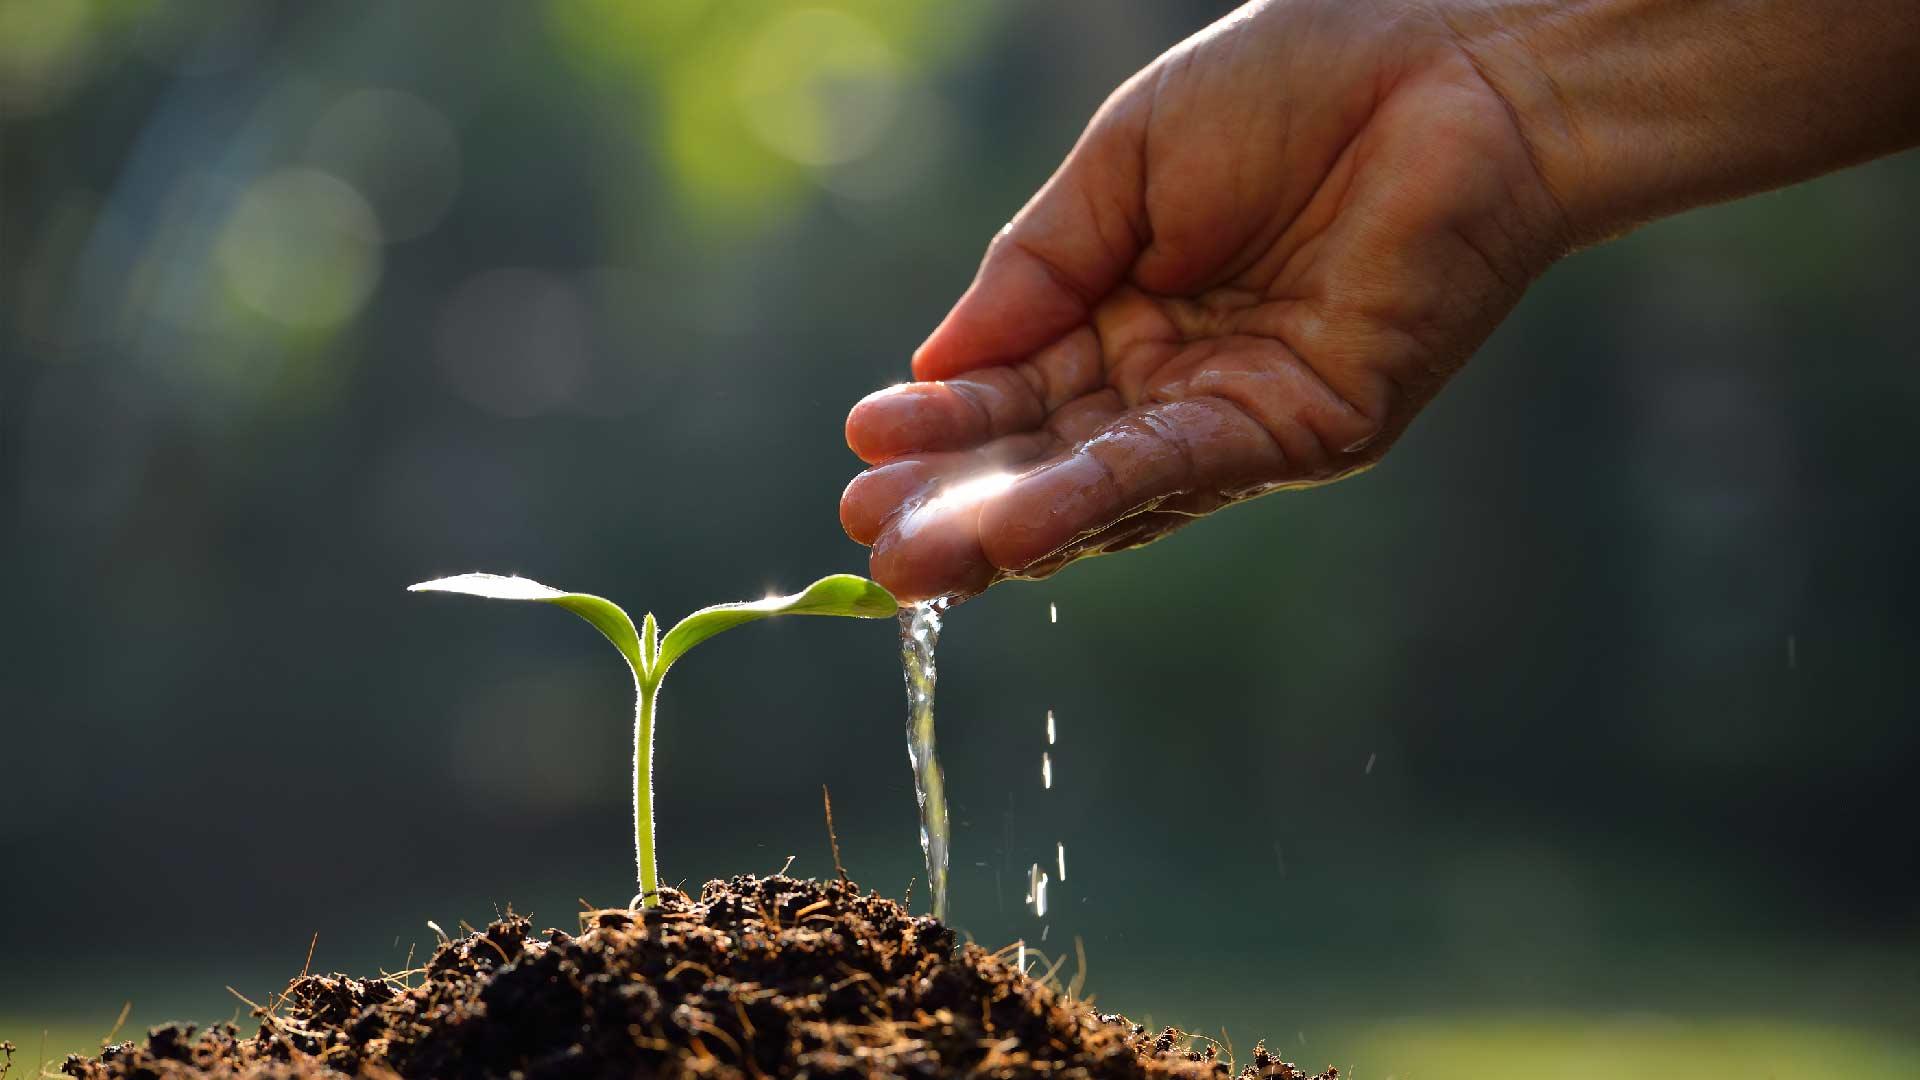 letting-seed-grow.jpg